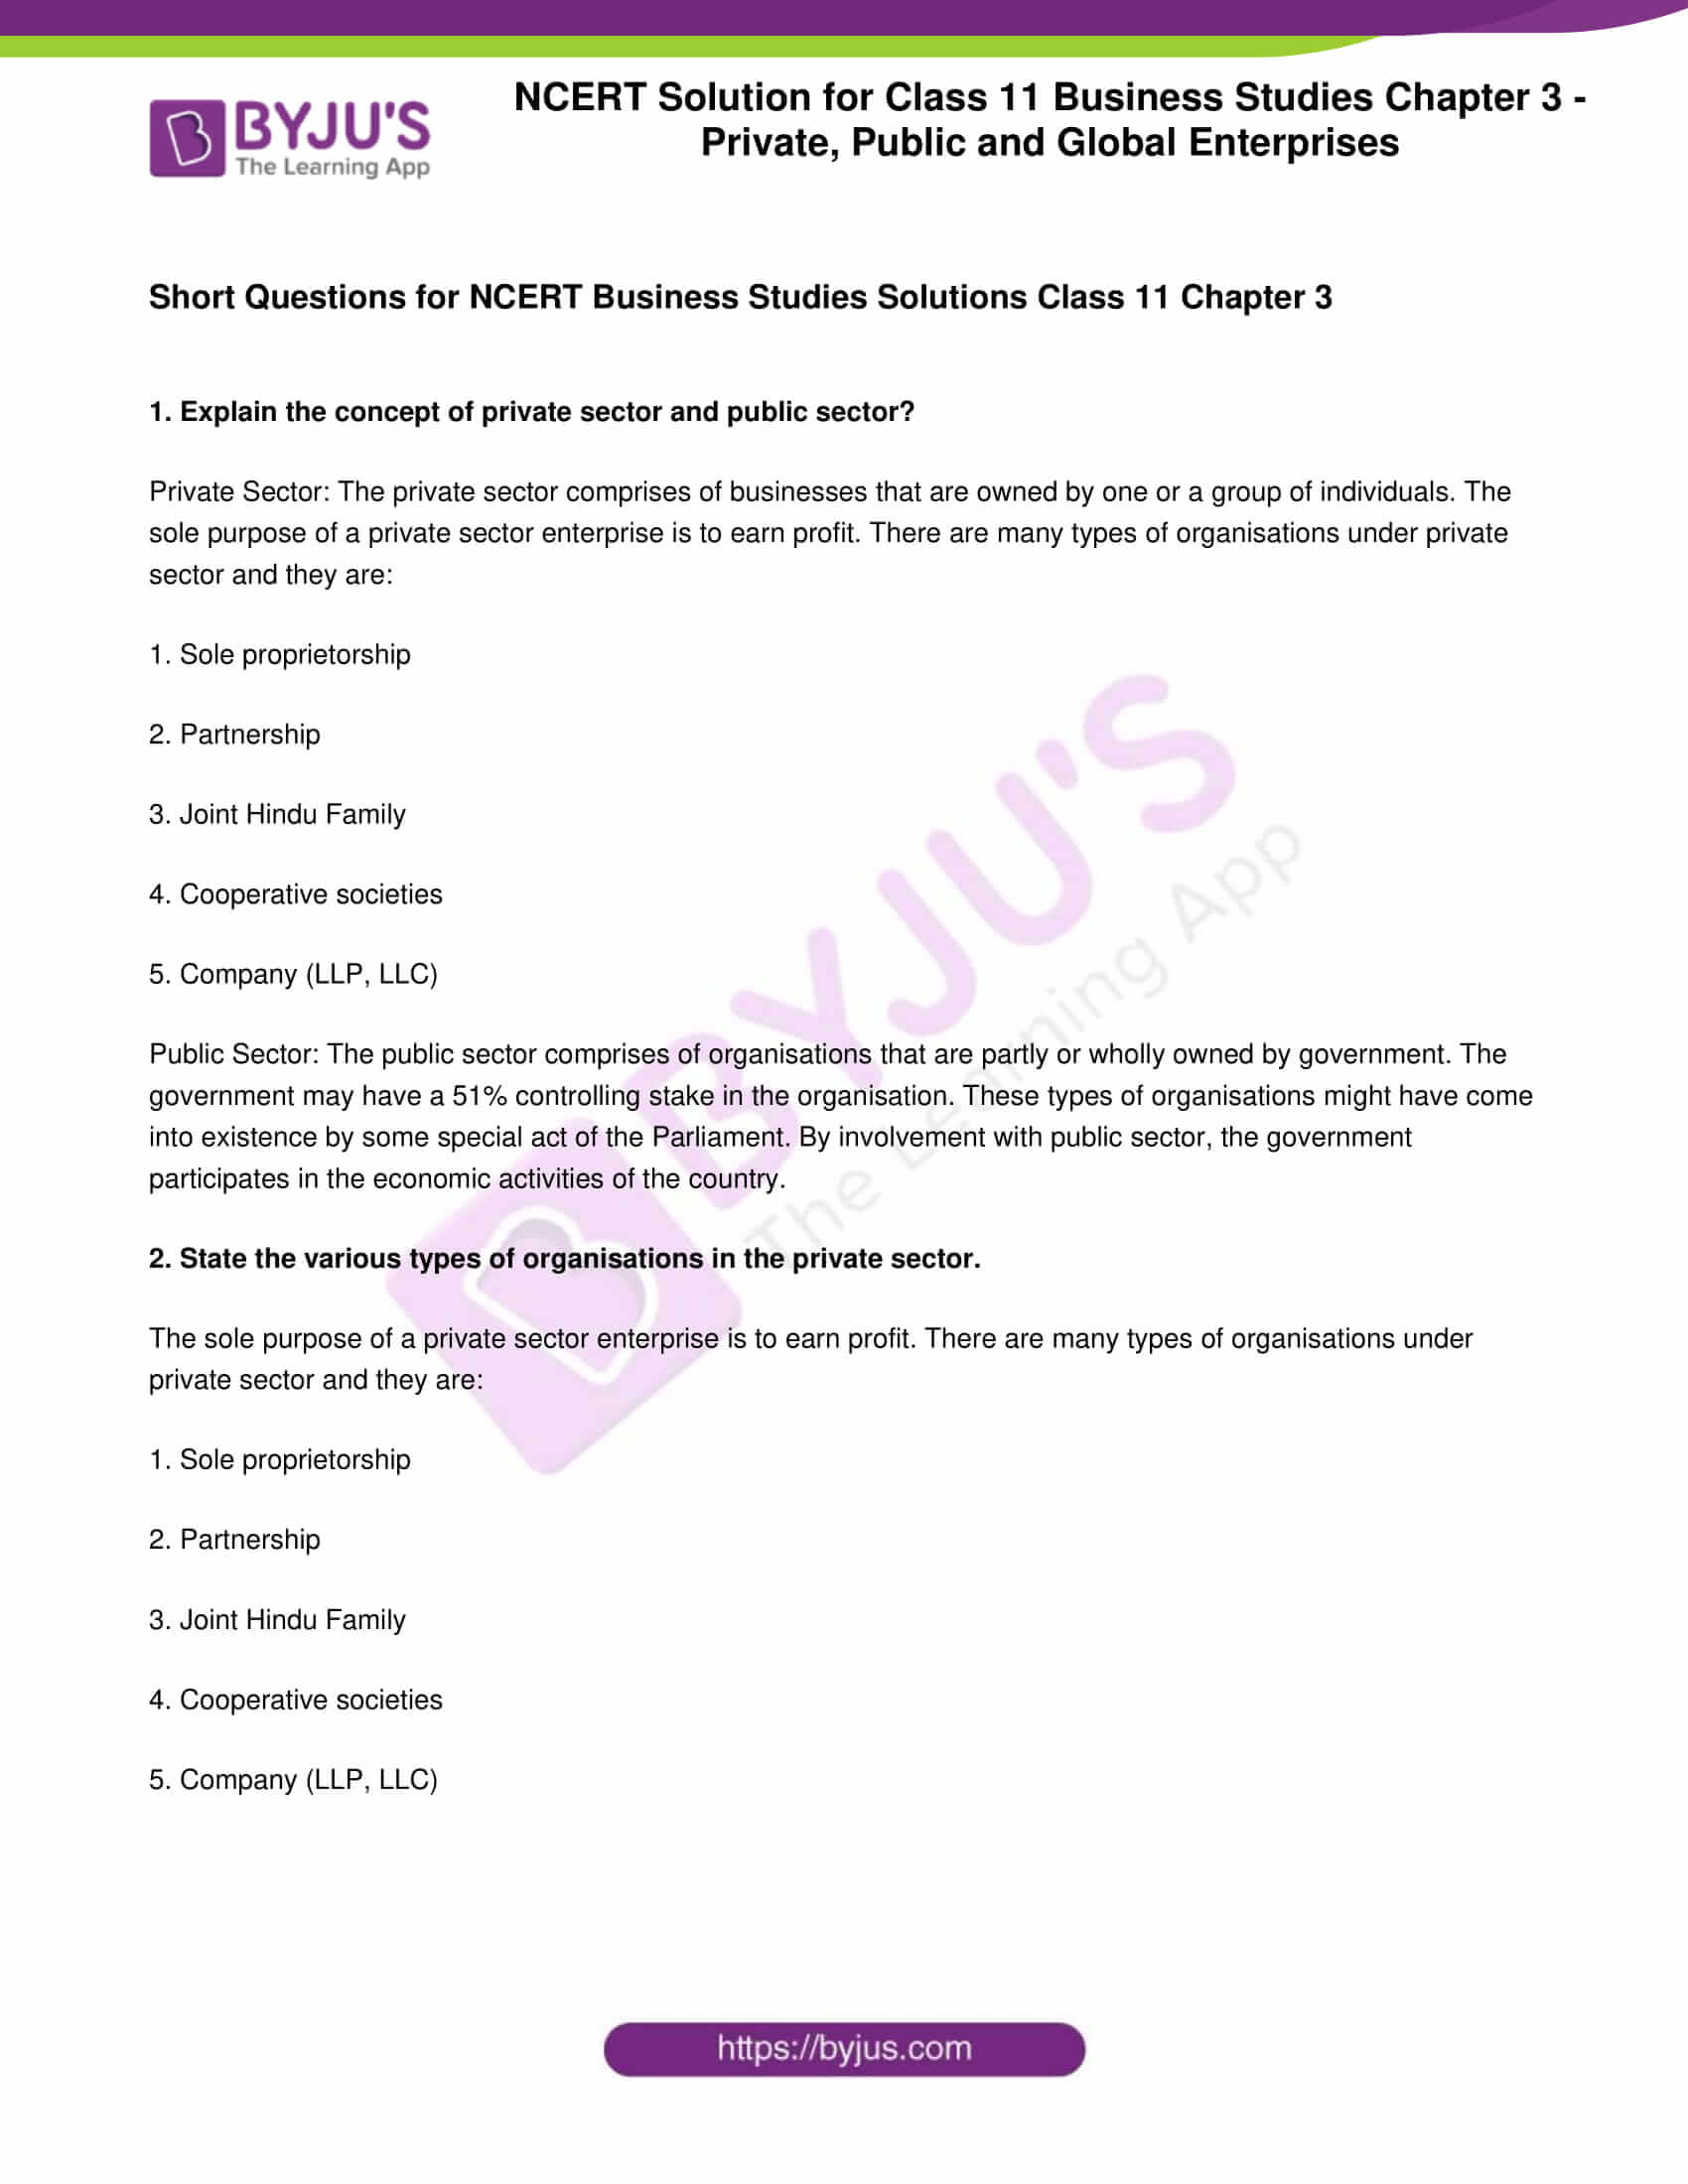 CBSE Class 11 Business Studies Syllabus 2020-21